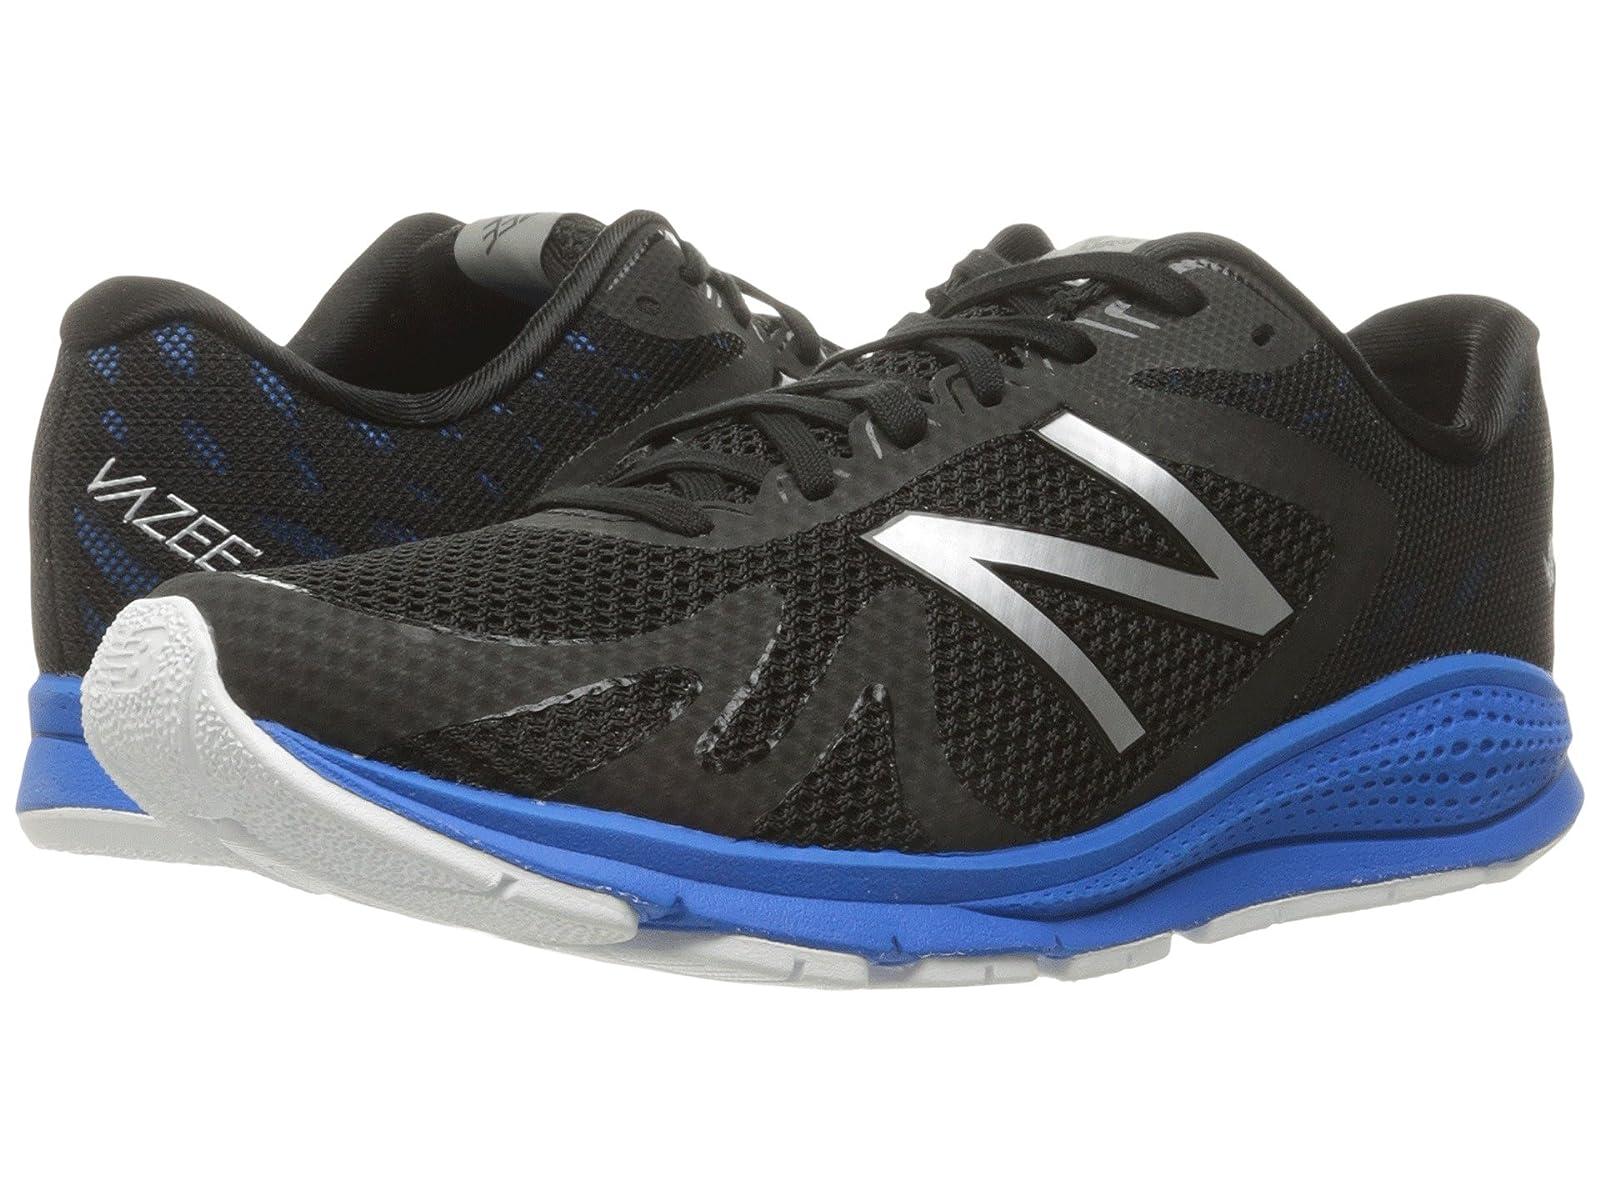 New Balance Vazee Urge v1Cheap and distinctive eye-catching shoes